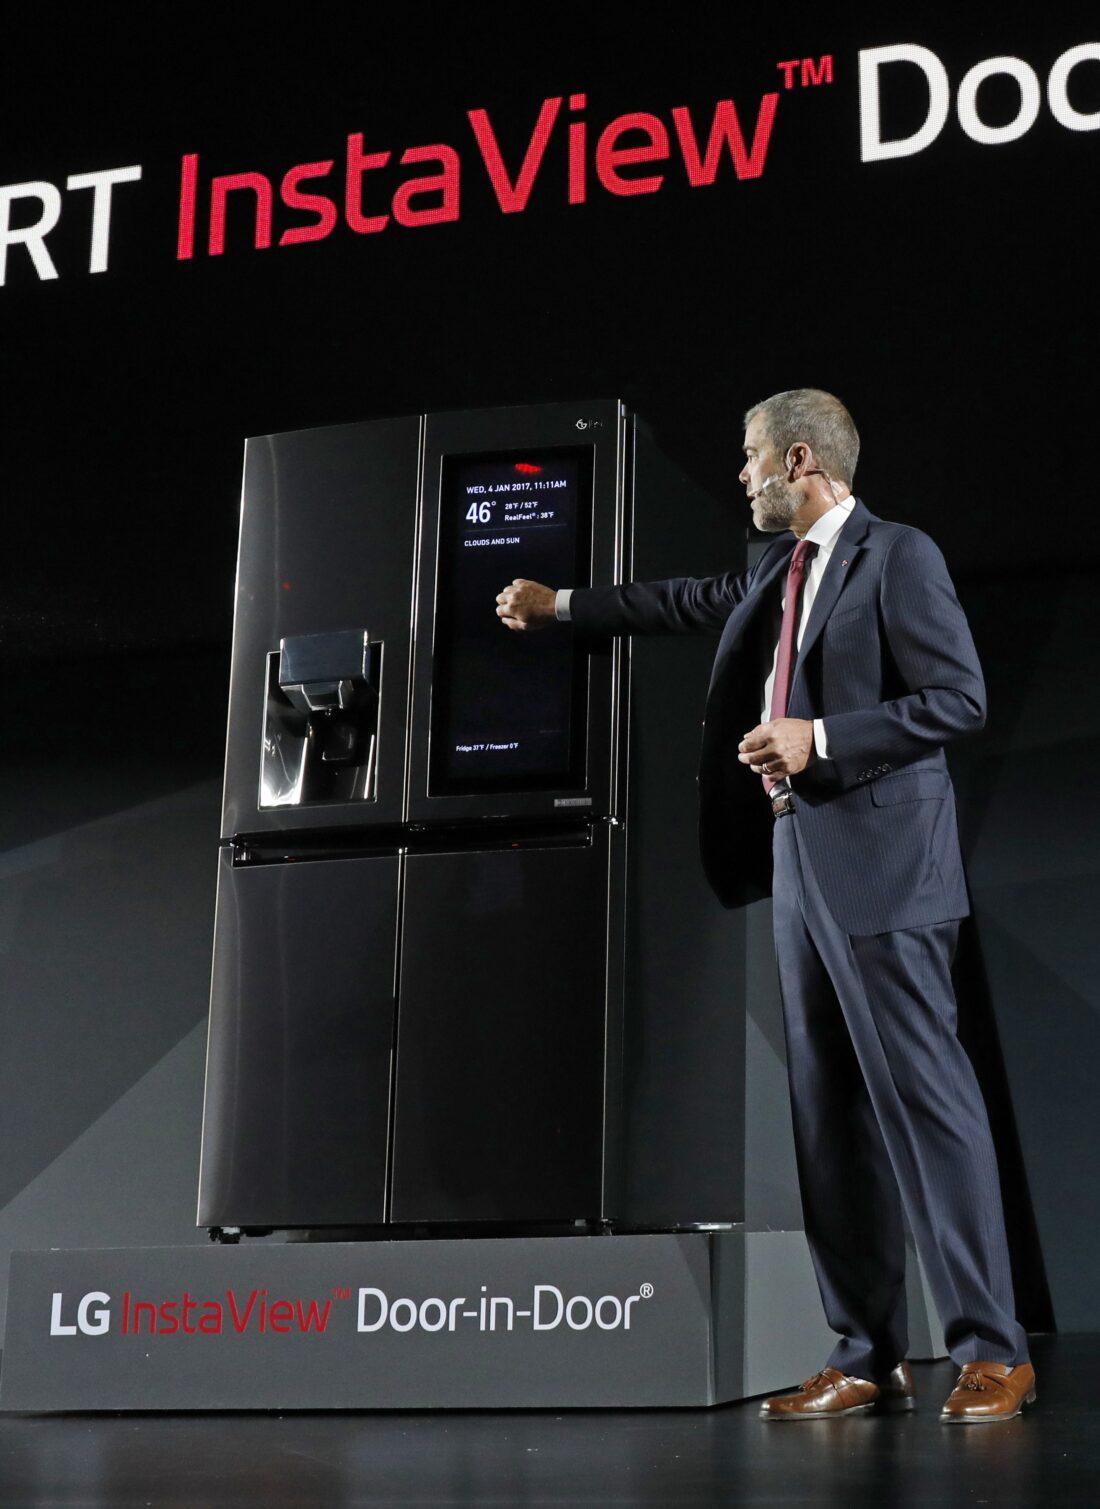 David VanderWaal, Senior Vice President, Marketing, LG Electronics demonstrates the InstaView feature of LG's InstaView Door-in-Door refrigerator at its CES 2017 Press Conference.